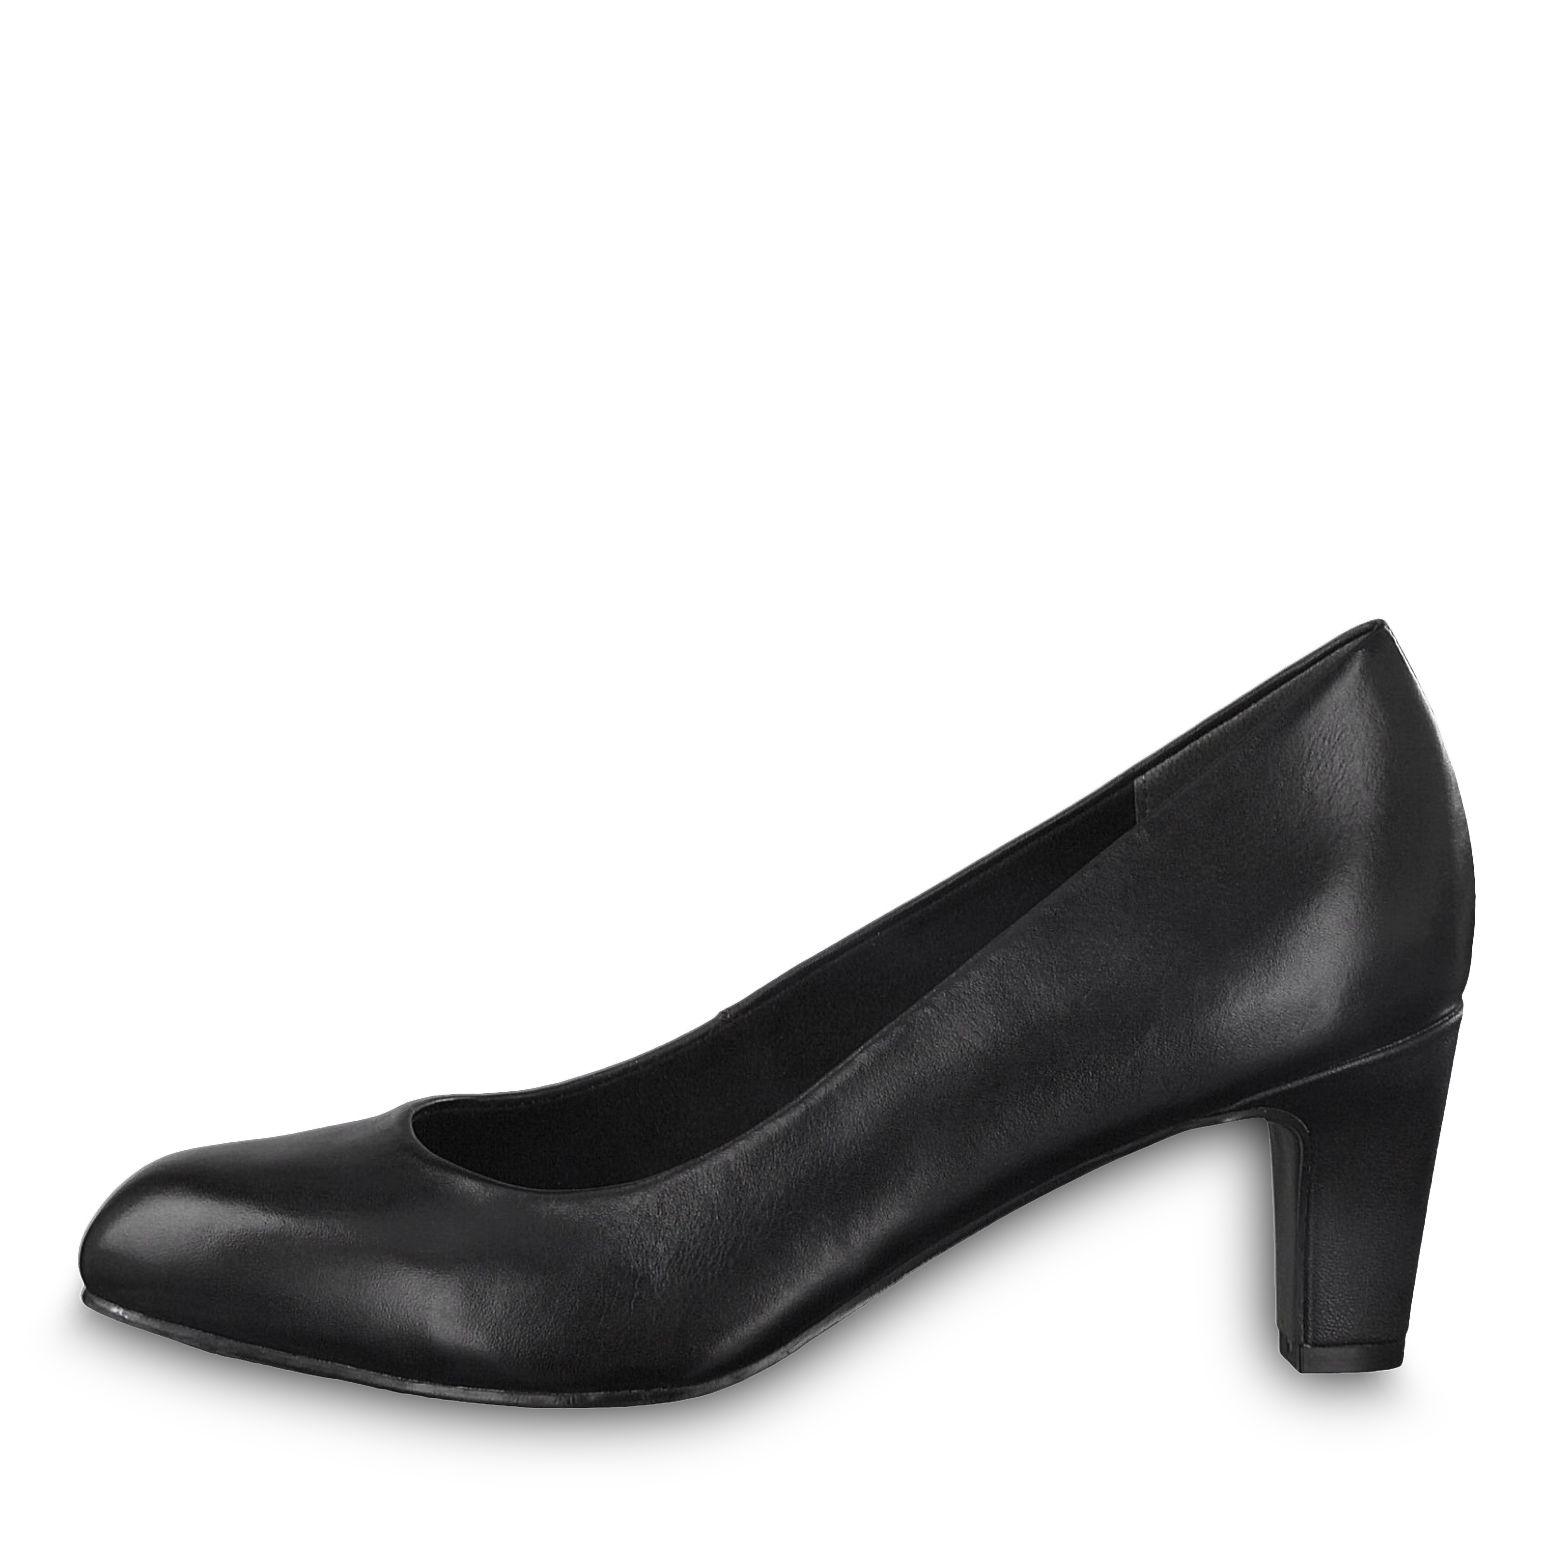 22429, Escarpins Femme, Noir (Black Uni), 39 EUTamaris